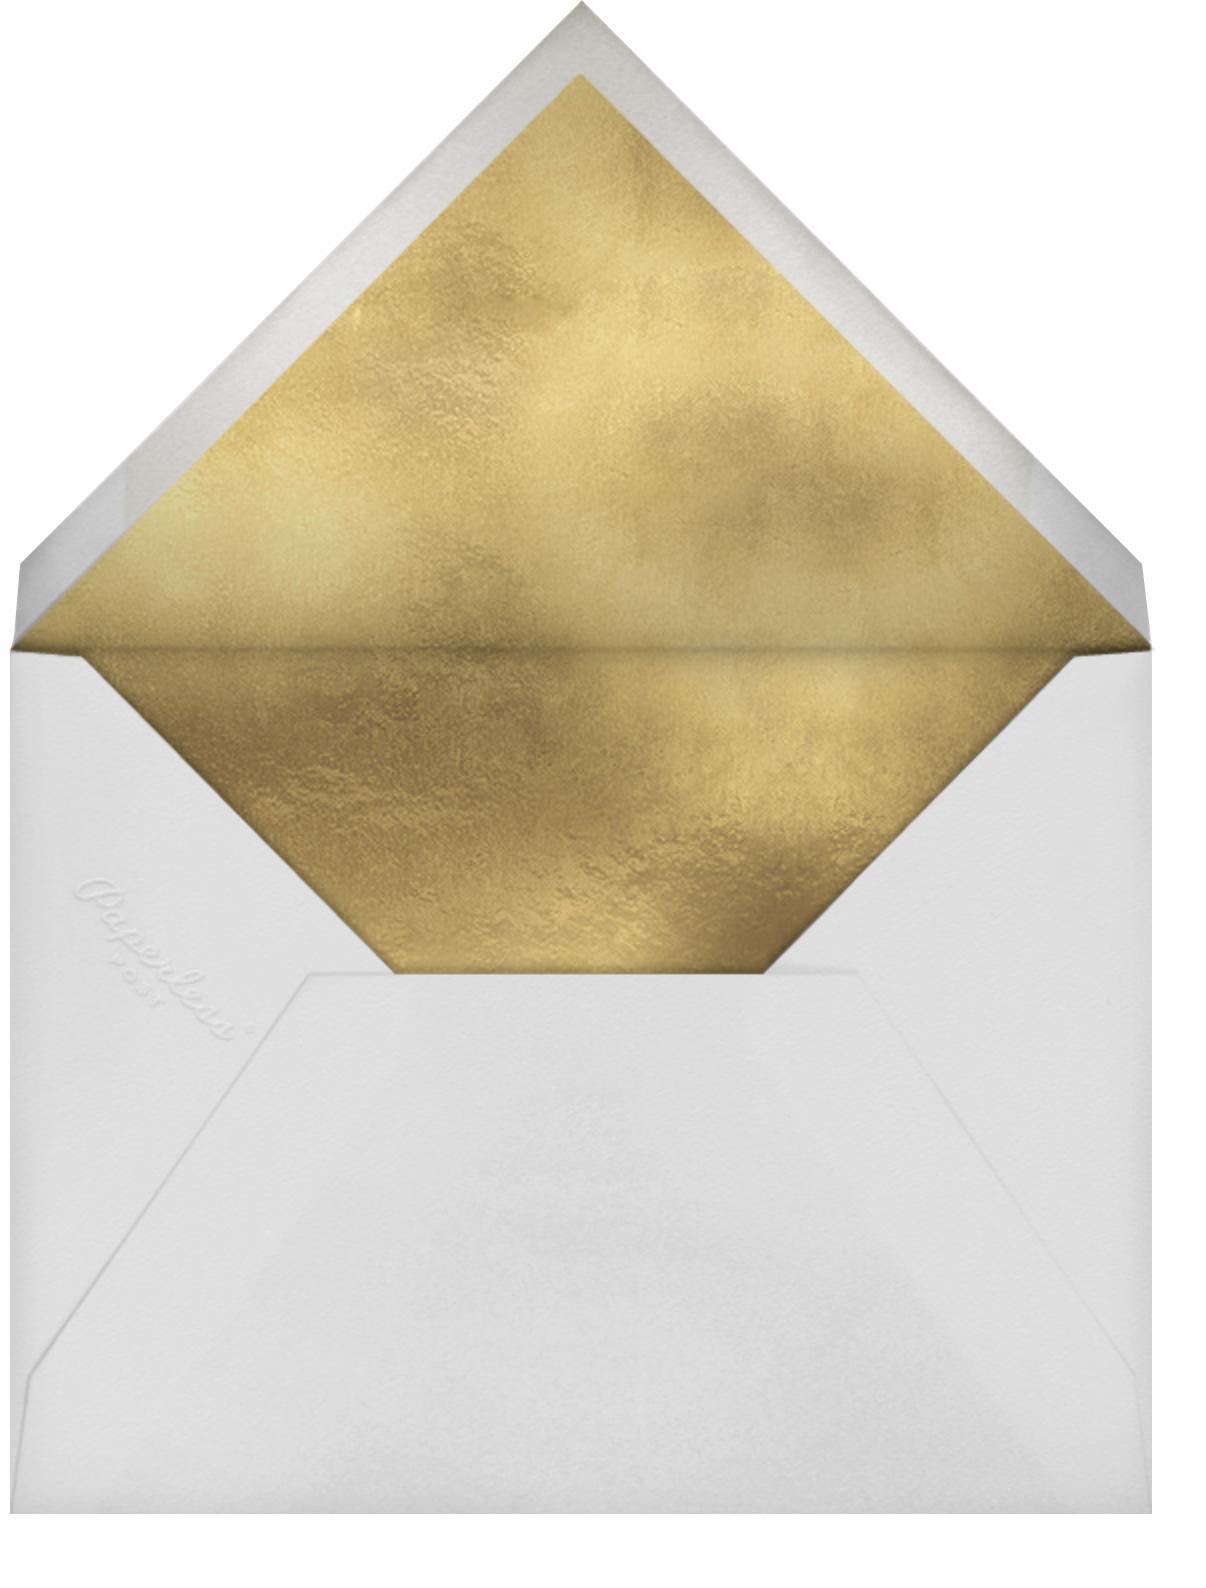 Fionola - Paperless Post - Bridal shower - envelope back